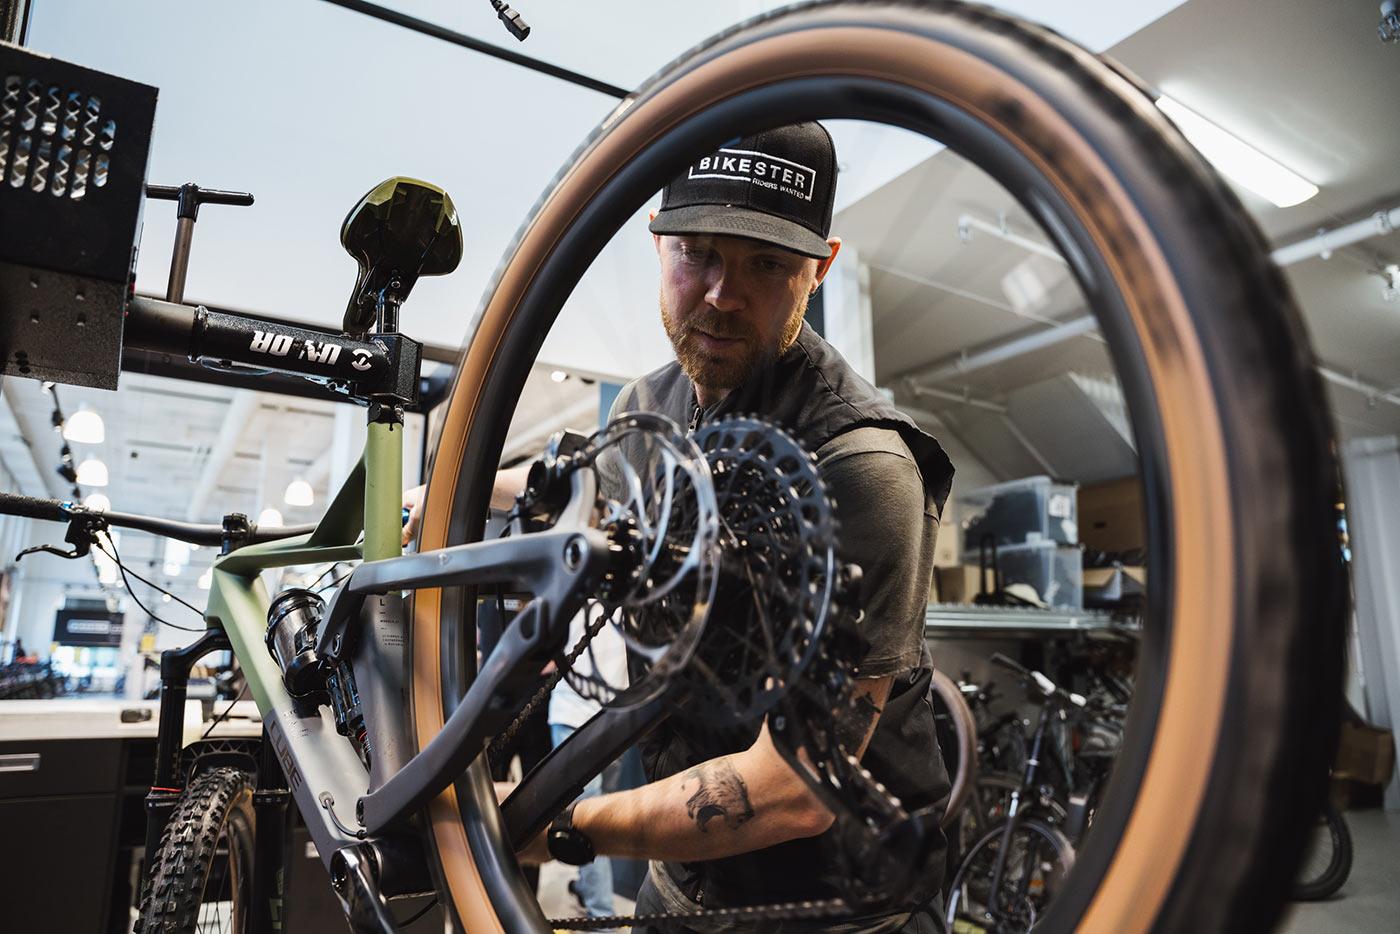 bikester store retail bike shop repair center